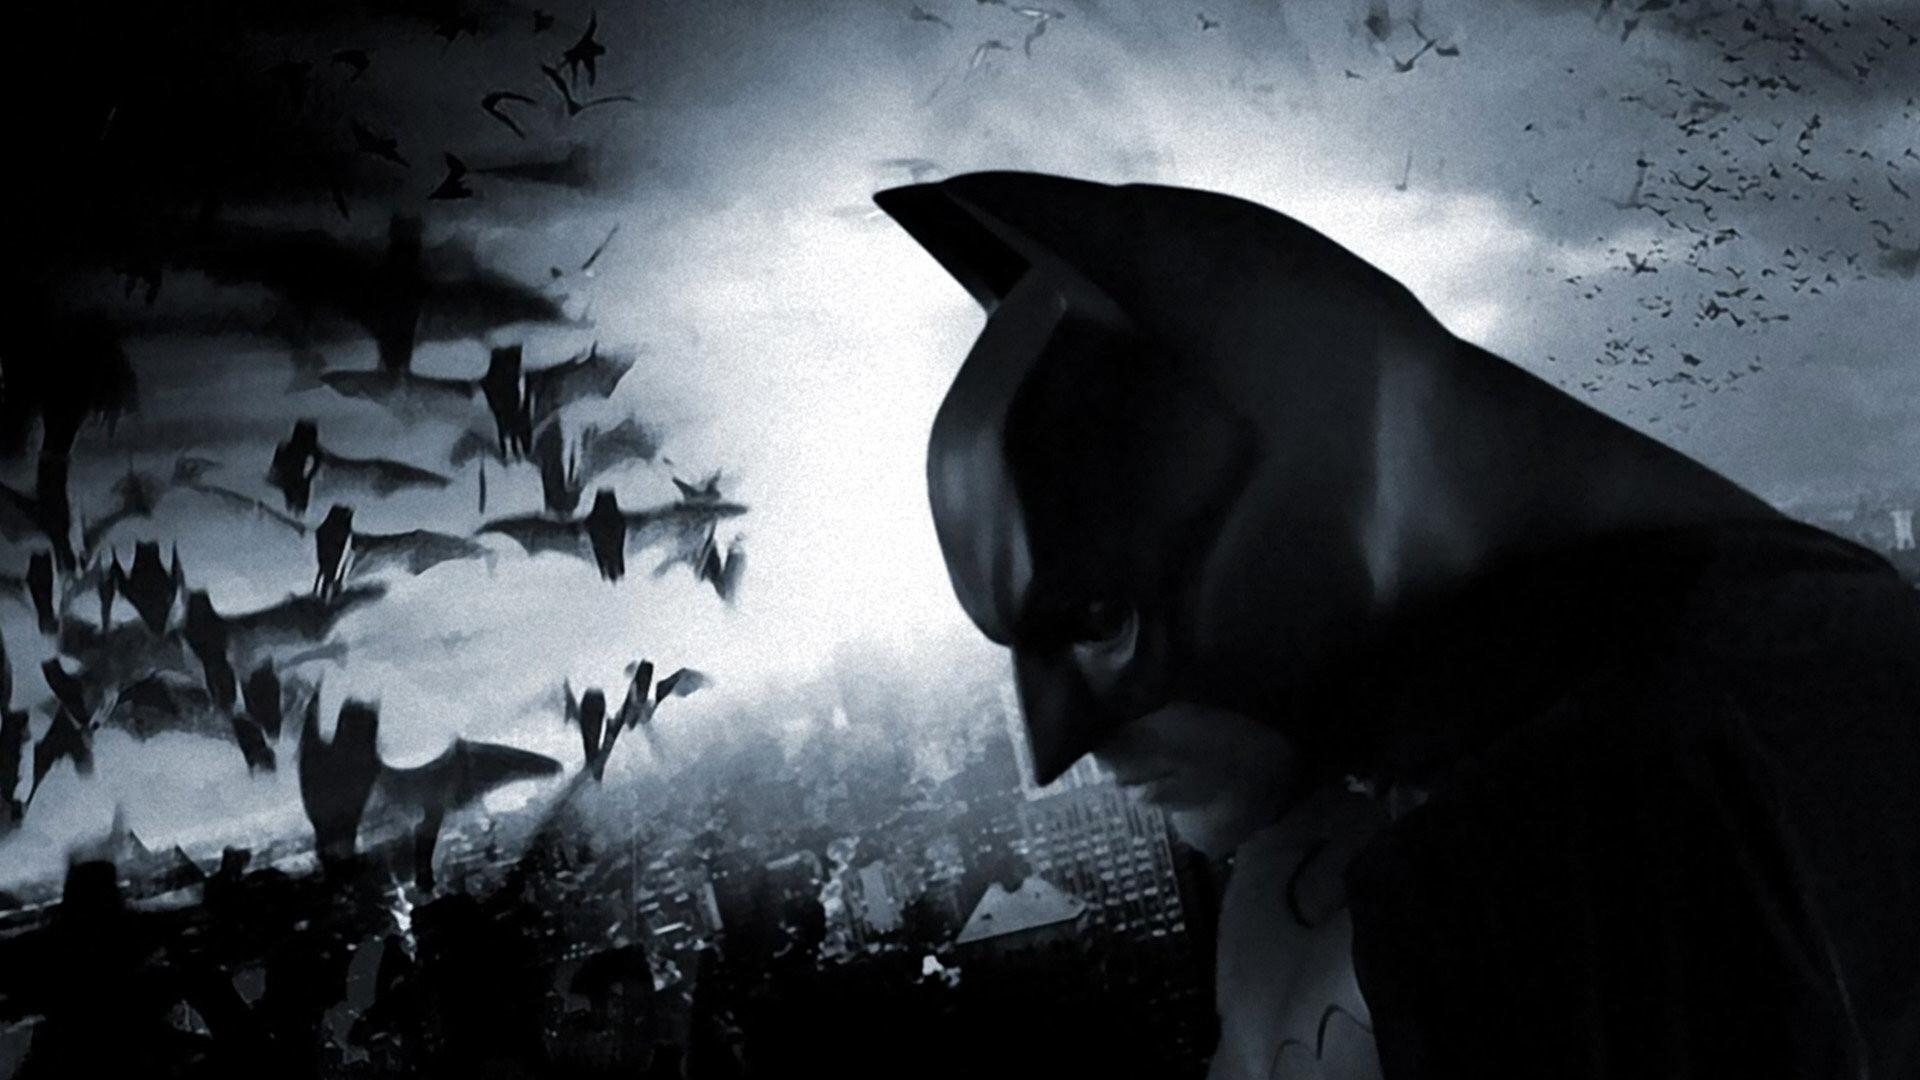 Batman HD Desktop Wallpaper 1920x1080 - WallpaperSafari